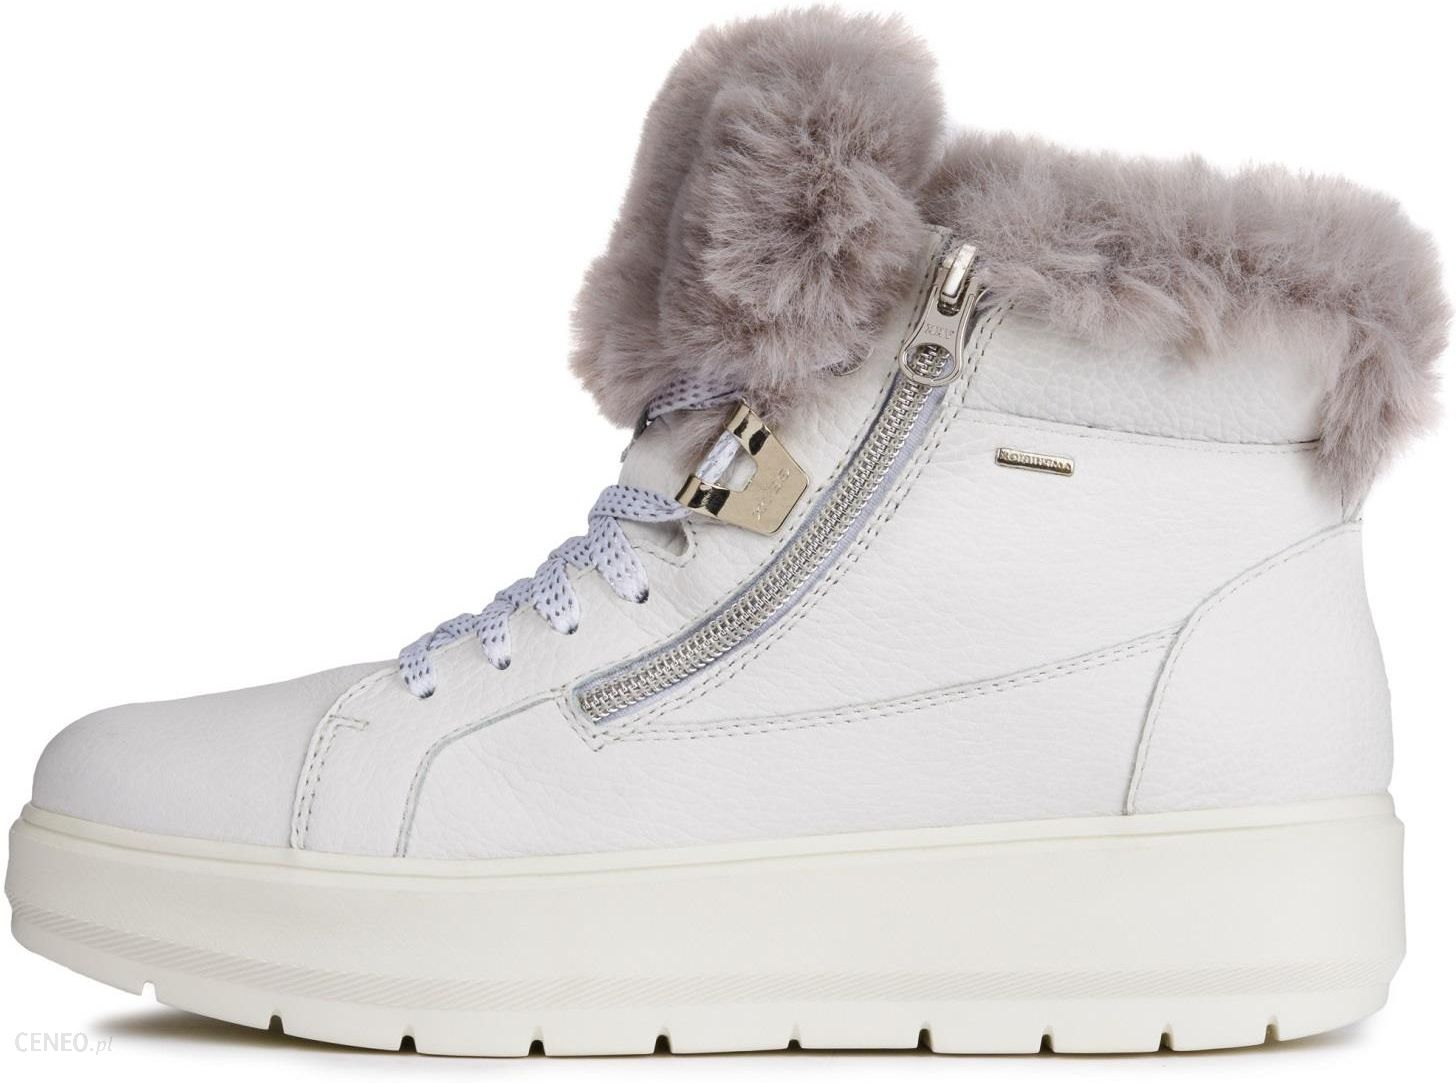 buty zimowe damskie zimowe